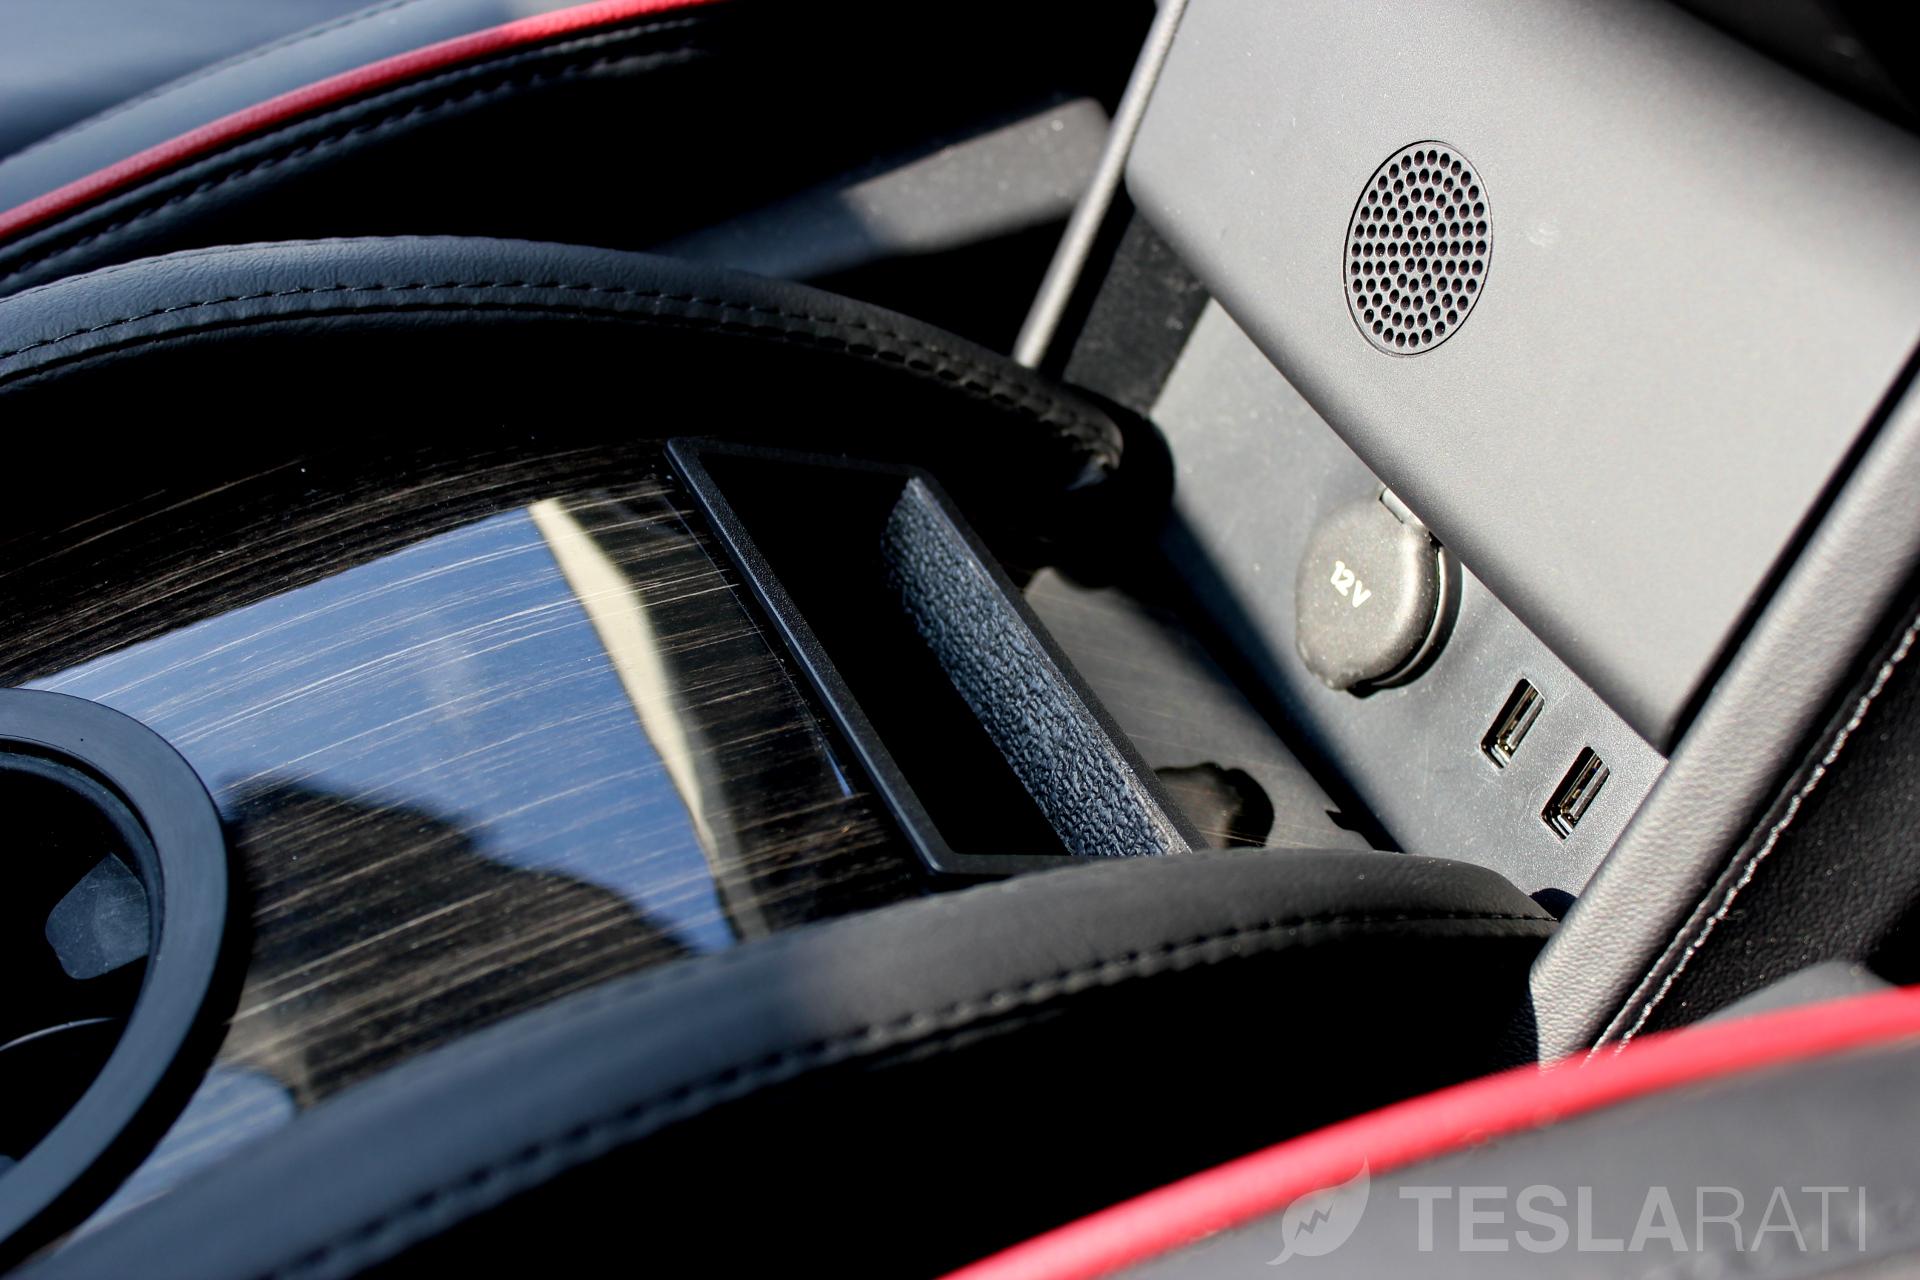 Teslaccessories-CCI-USB-Connector-Slot